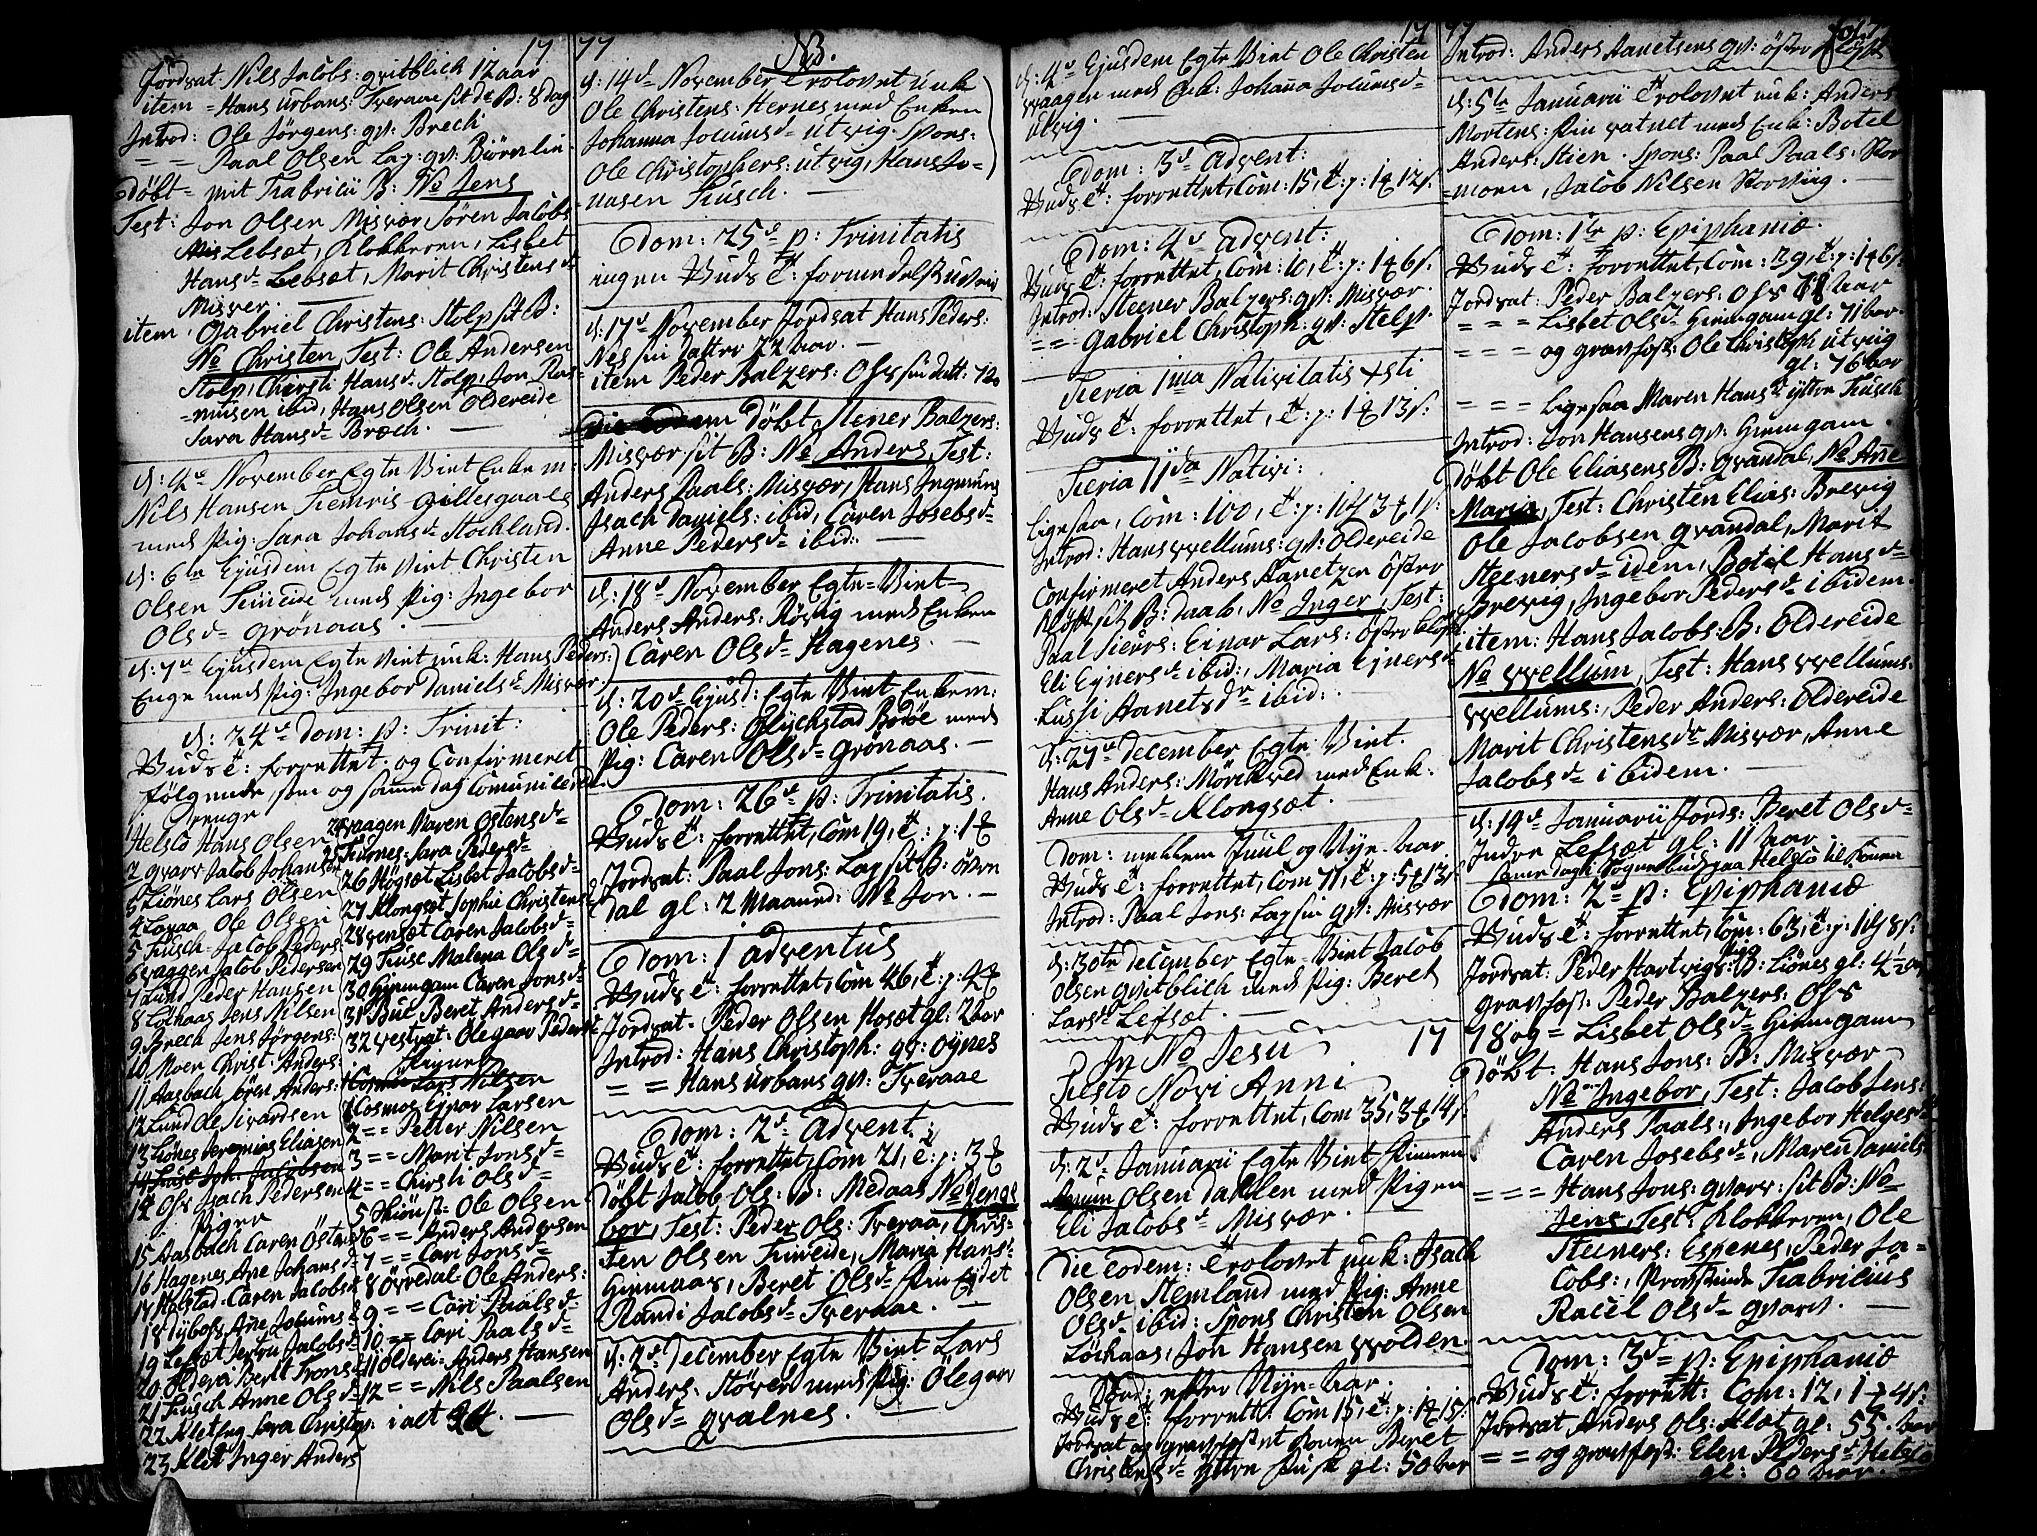 SAT, Ministerialprotokoller, klokkerbøker og fødselsregistre - Nordland, 852/L0735: Ministerialbok nr. 852A05, 1762-1820, s. 77